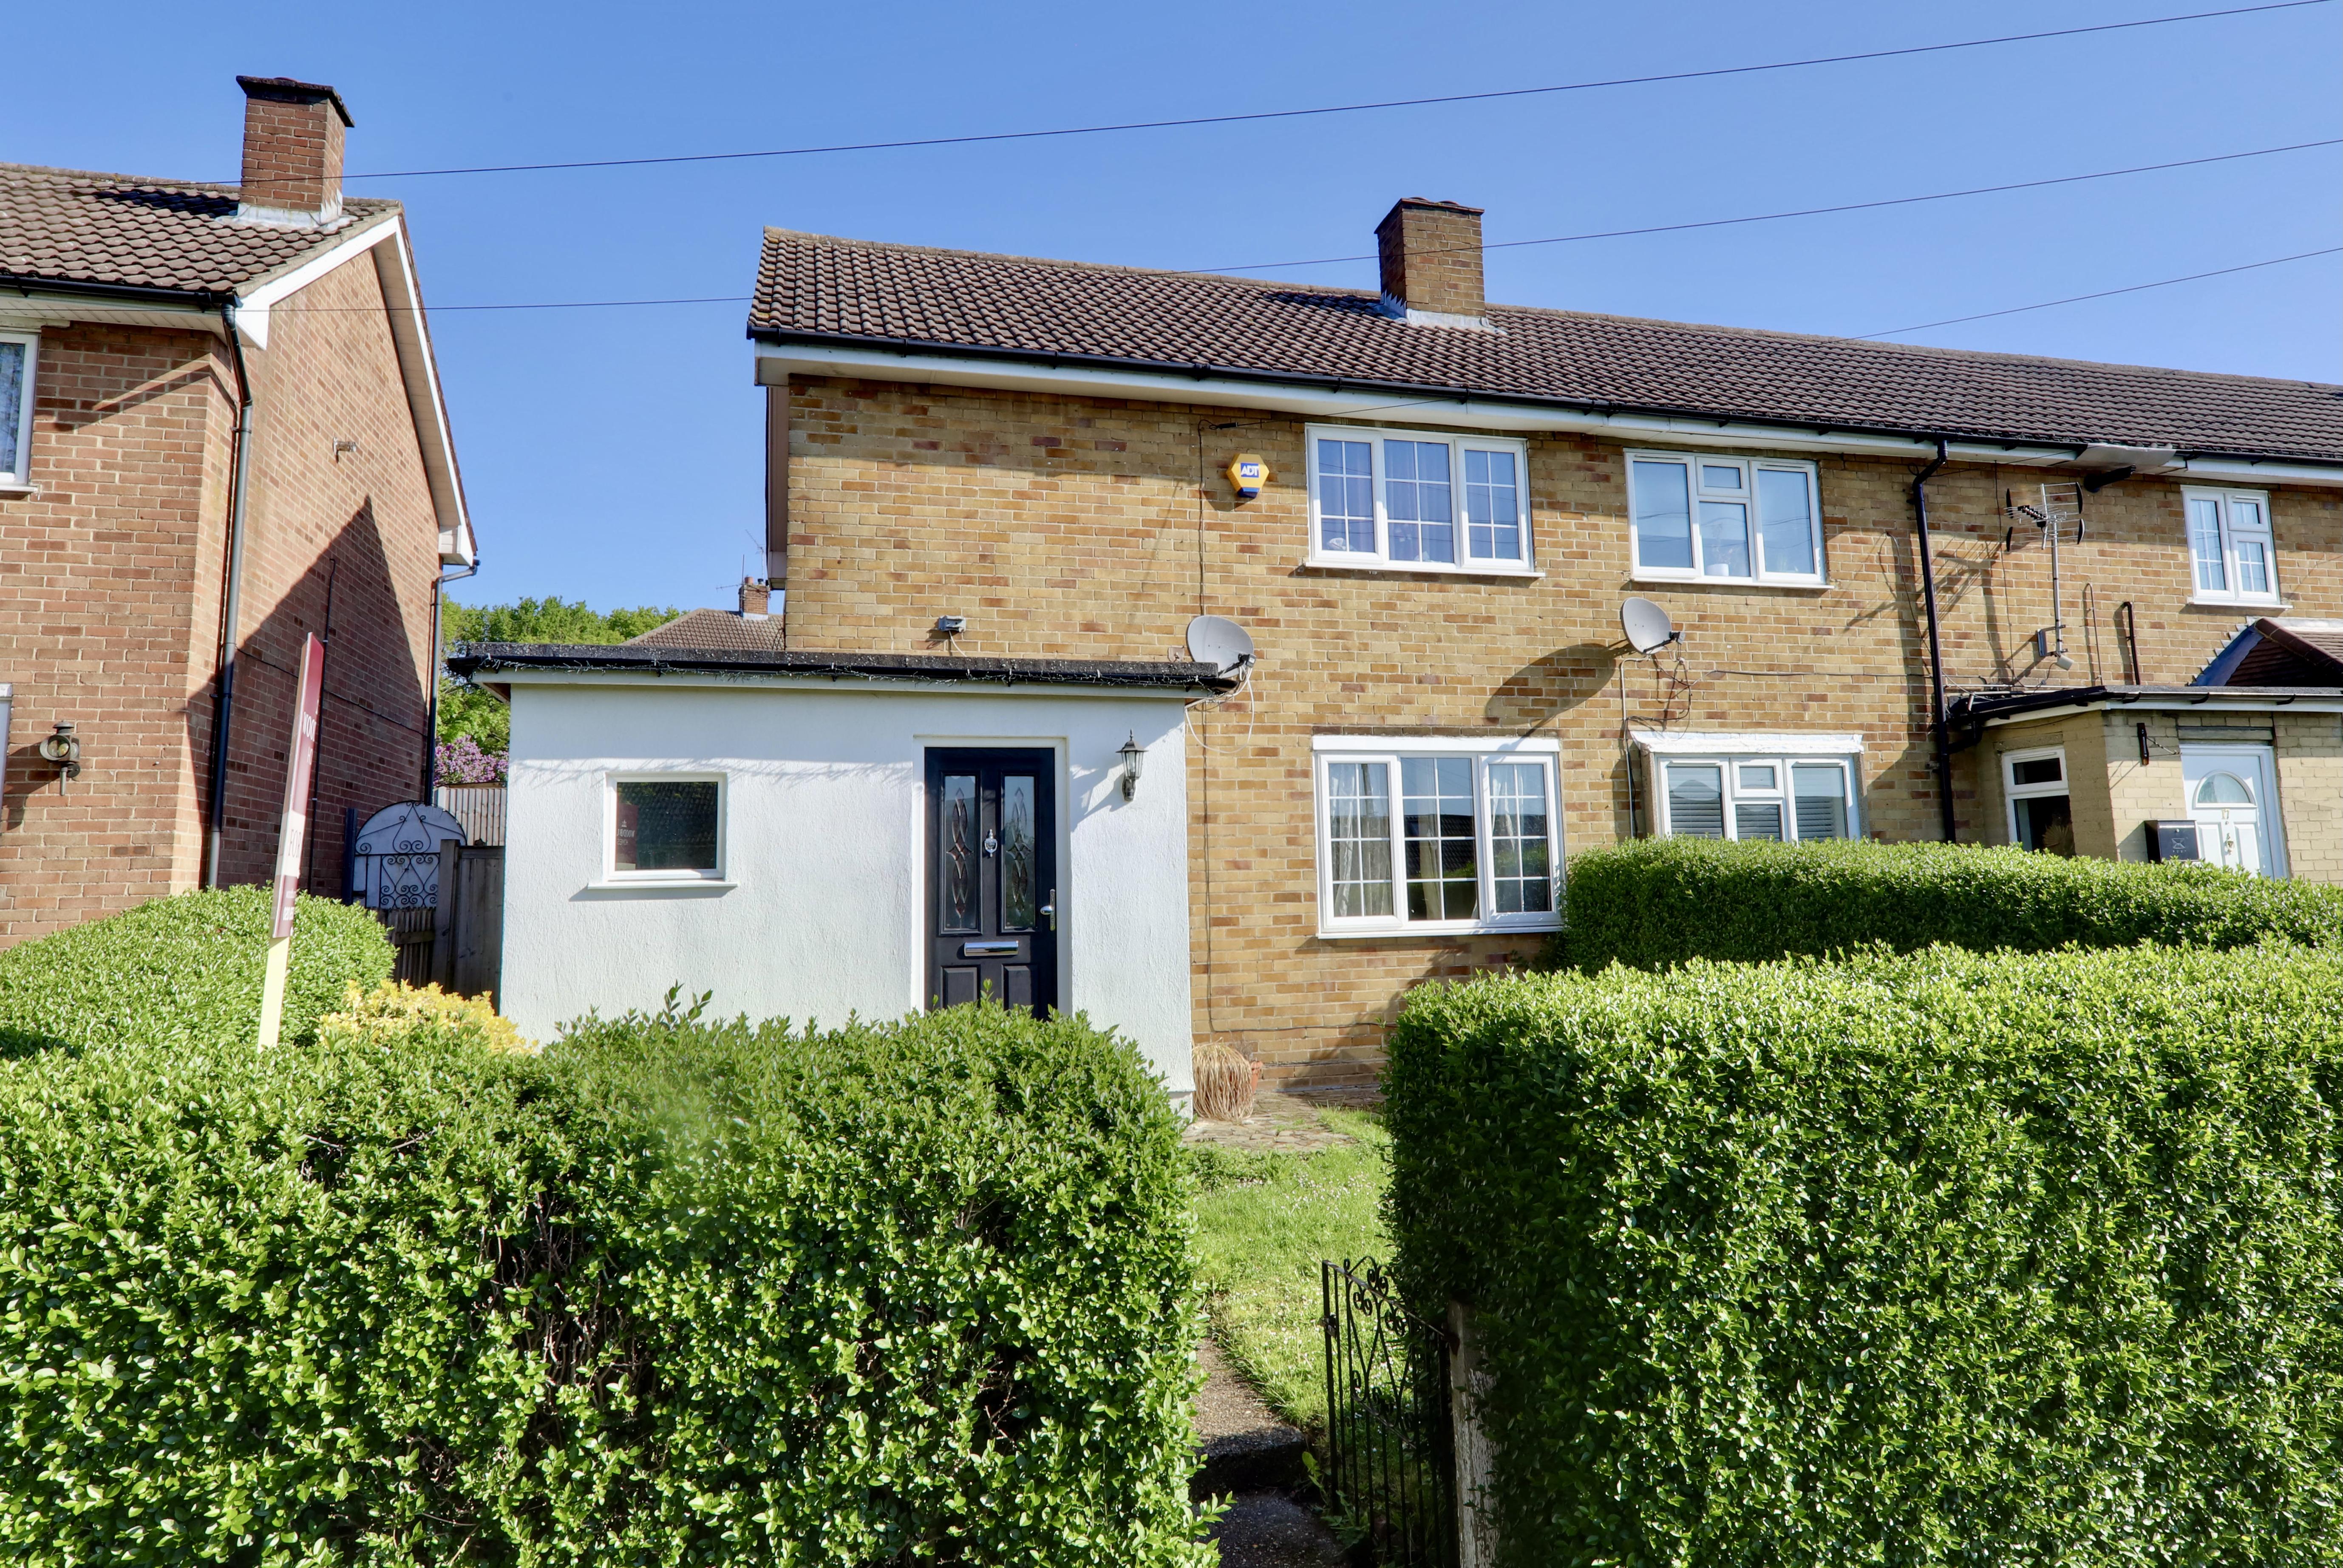 Barncroft Green, Loughton, Essex